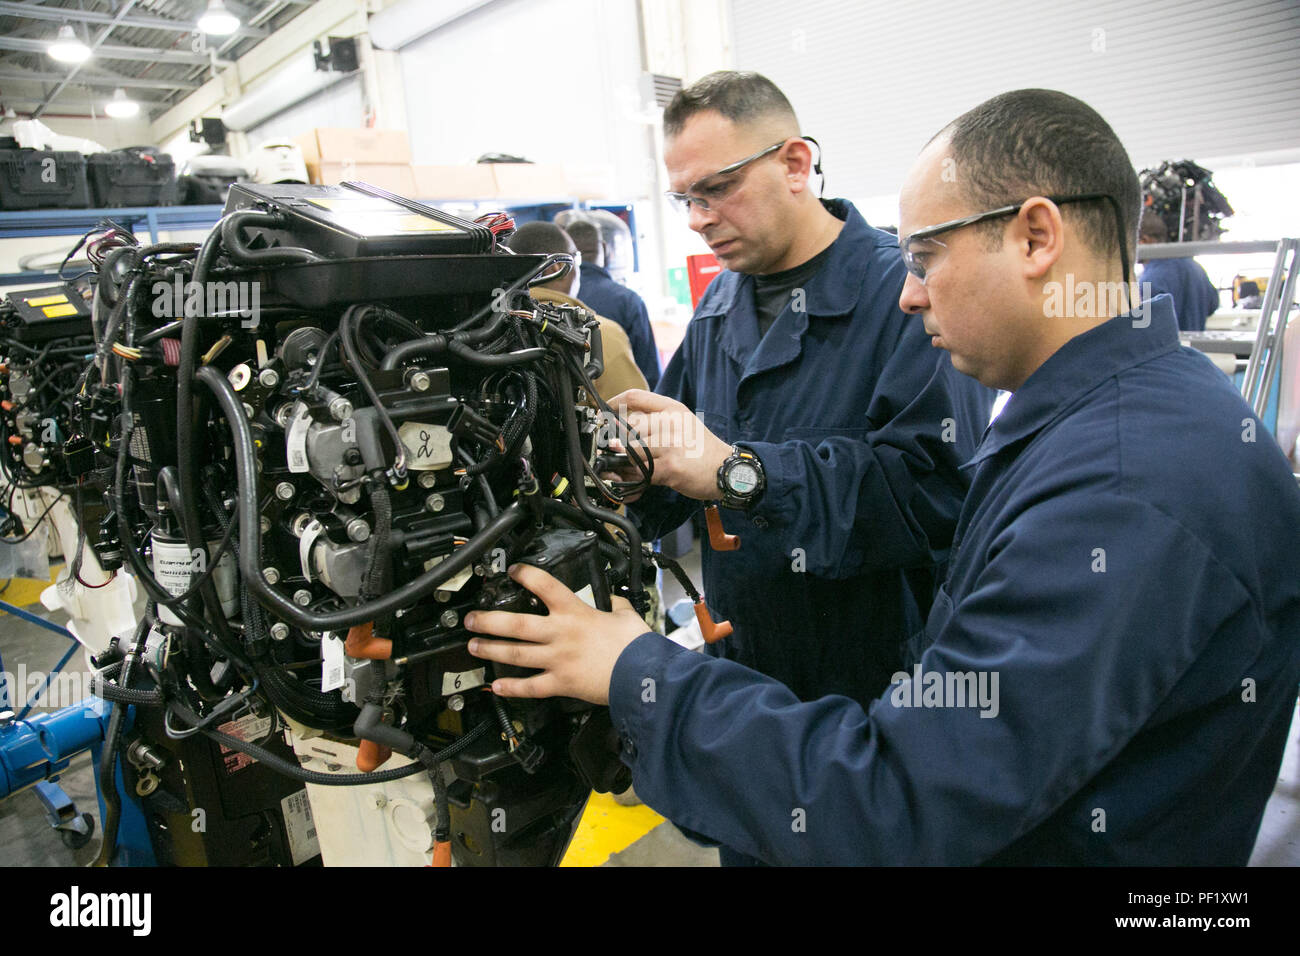 Marine Engine Repair School Near Me Free Owners Manual